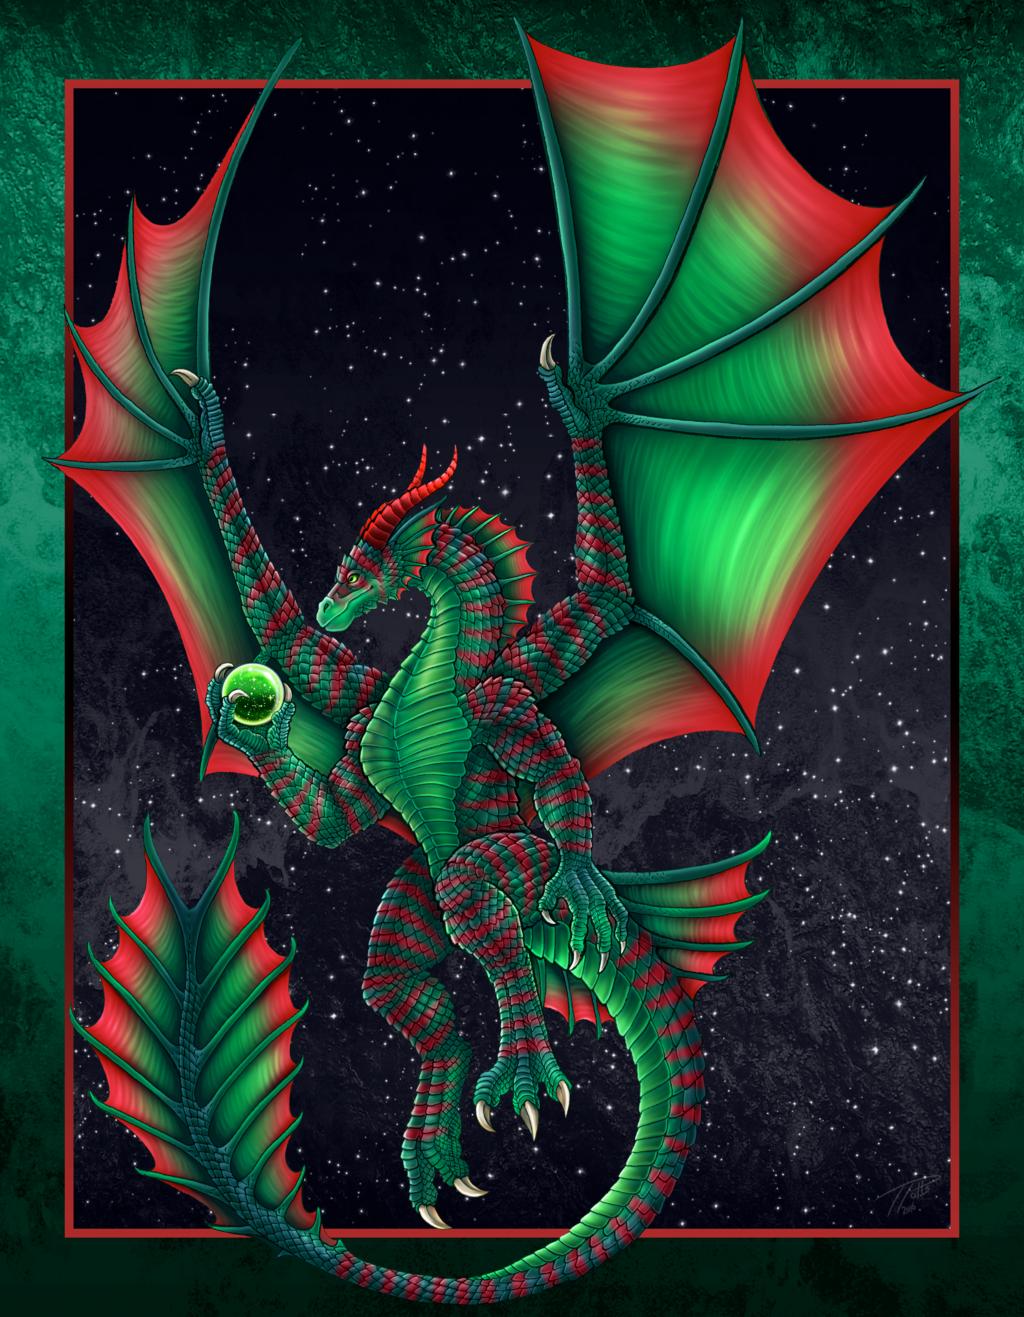 Christmas Dragon.Christmas Dragon 2016 By Dragonosx Dragons In 2019